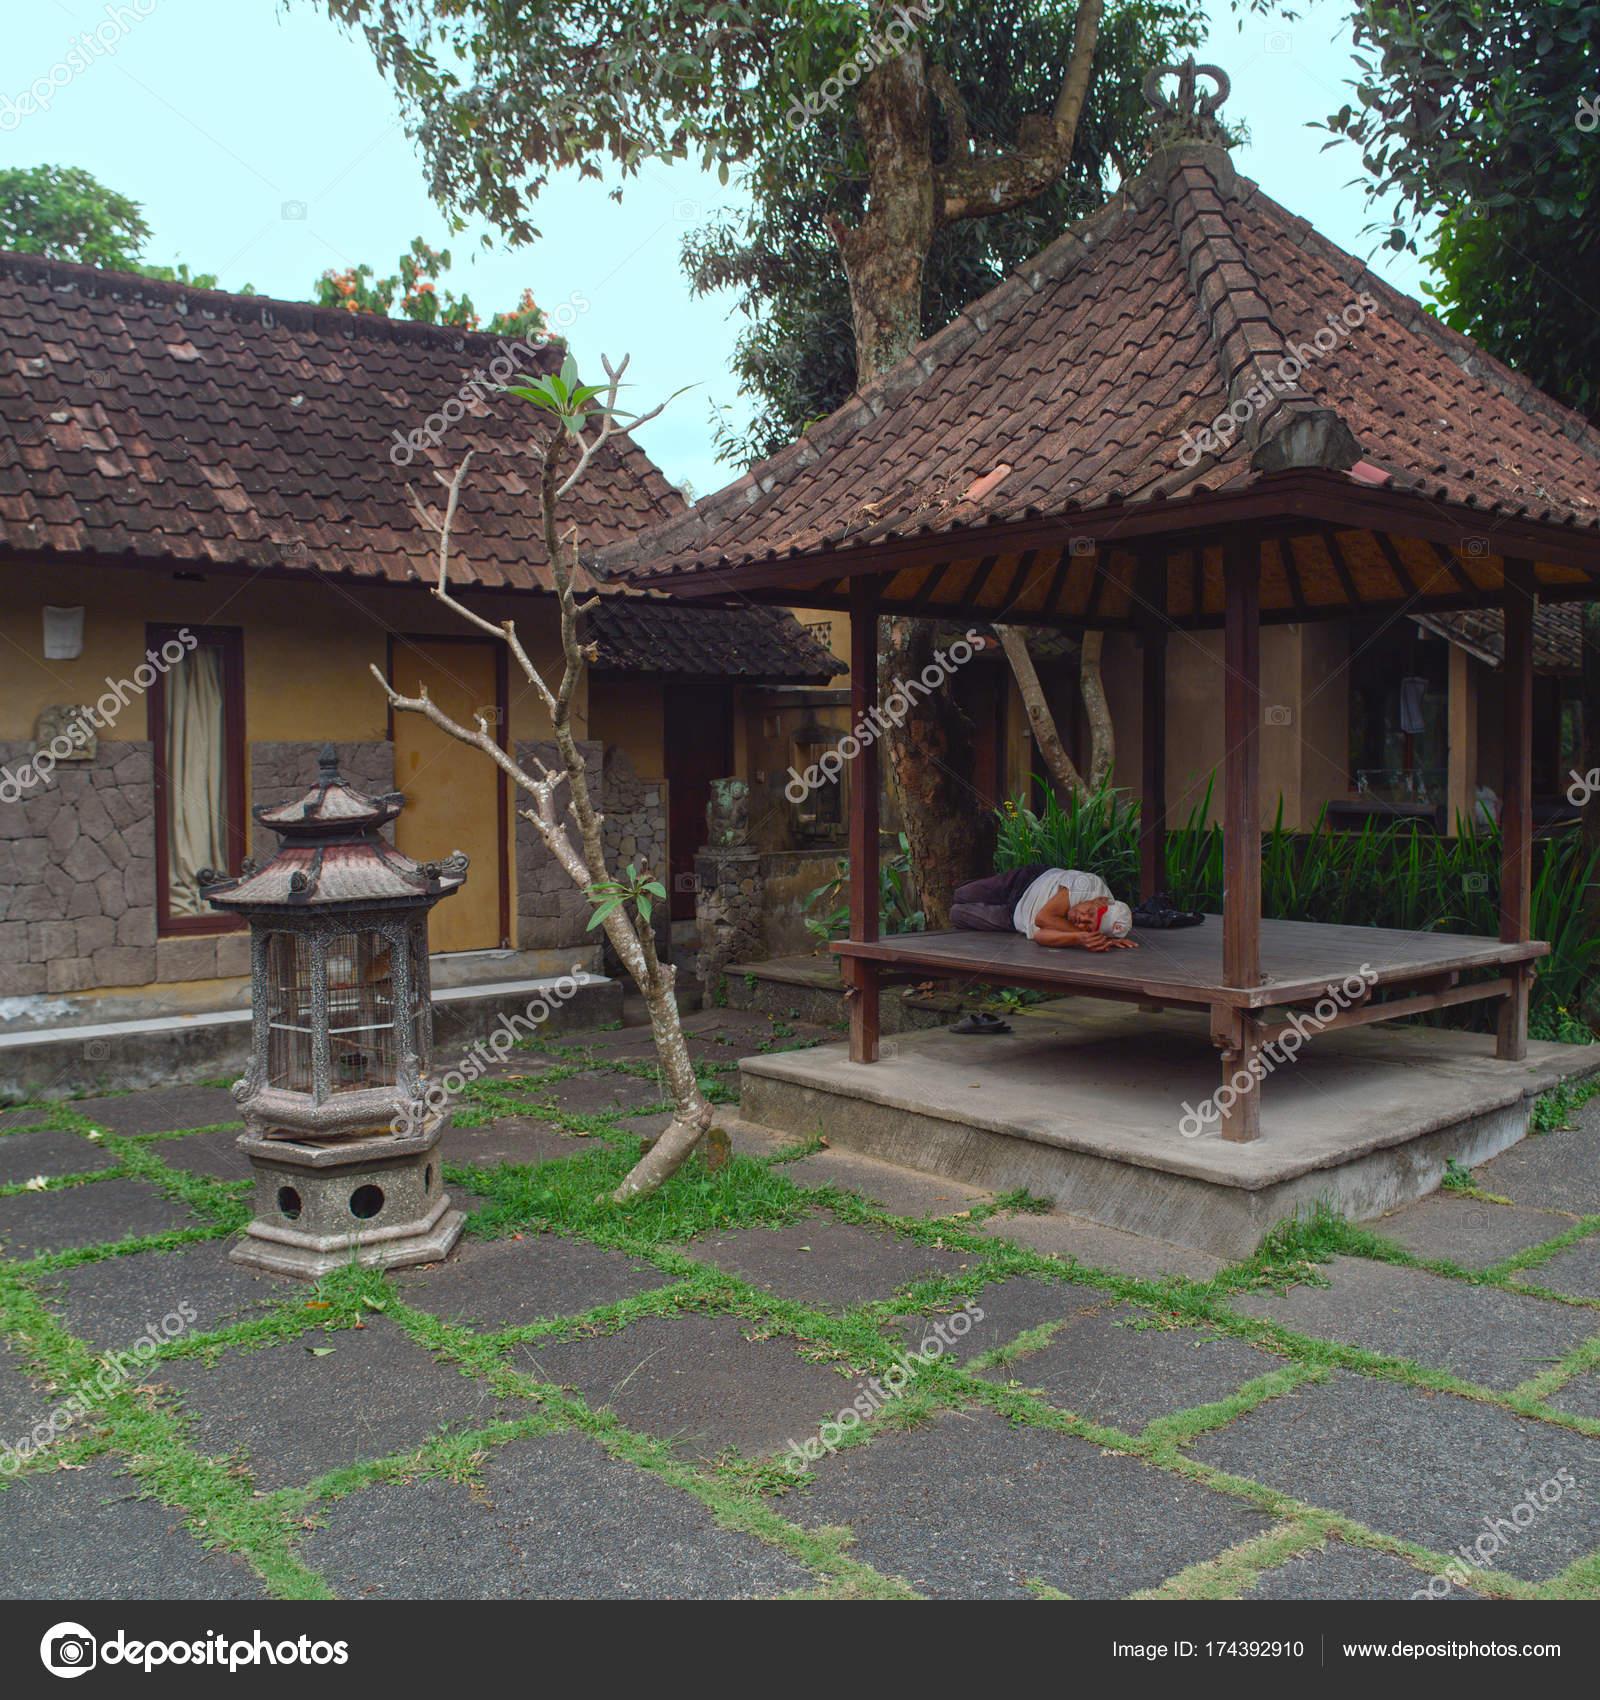 https://st3.depositphotos.com/1084918/17439/i/1600/depositphotos_174392910-stockafbeelding-ubud-gebied-van-bali-indonesi.jpg